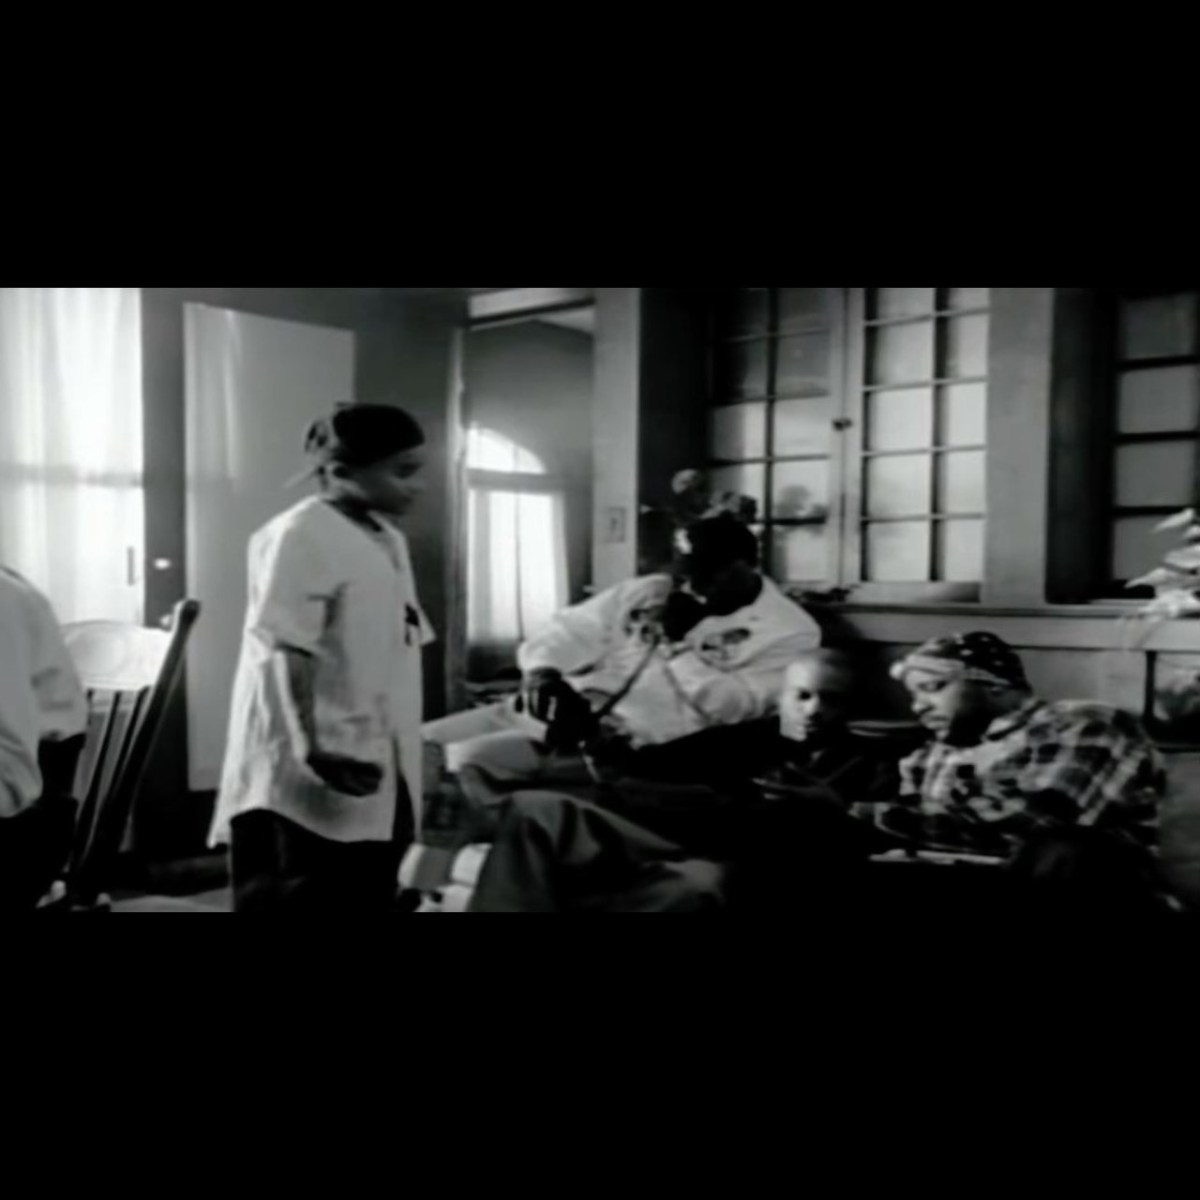 2Pac - Papa'z Song (ft. Wycked) (Thumbnail)